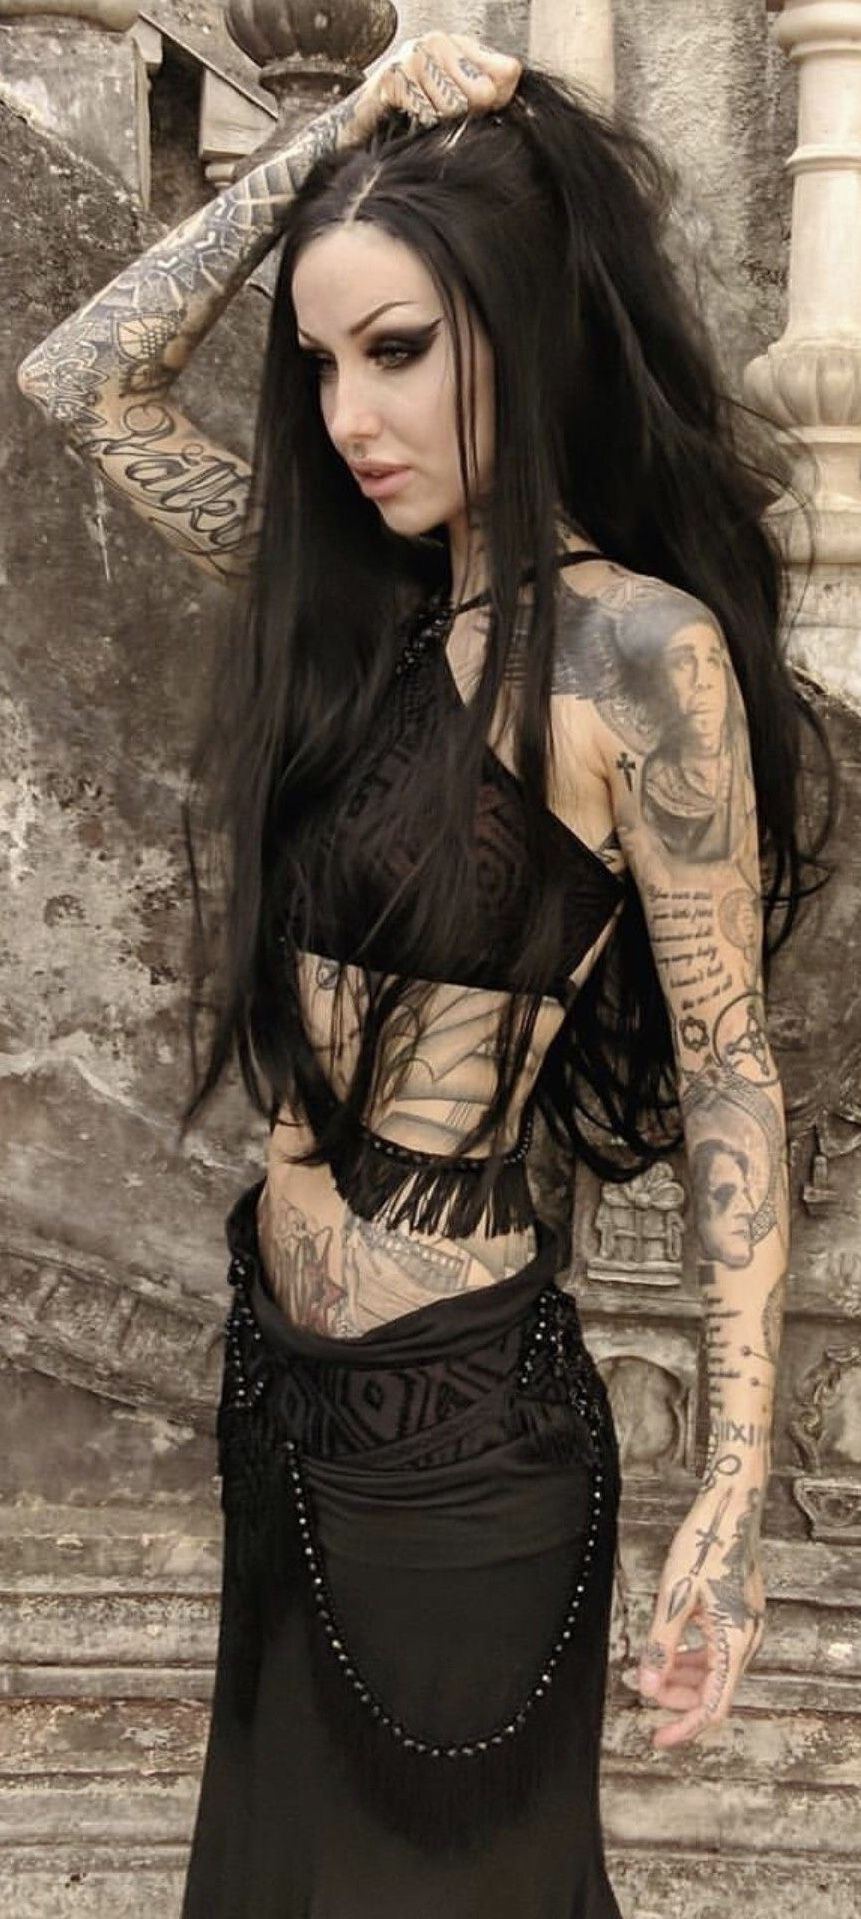 Ꭰєѕιяєє tatted goth gothic